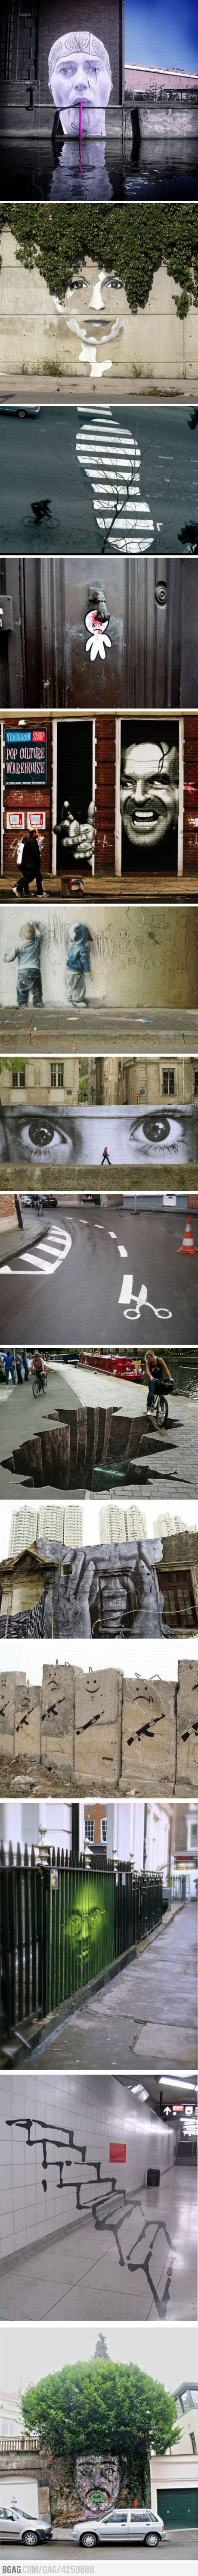 city art at its best...